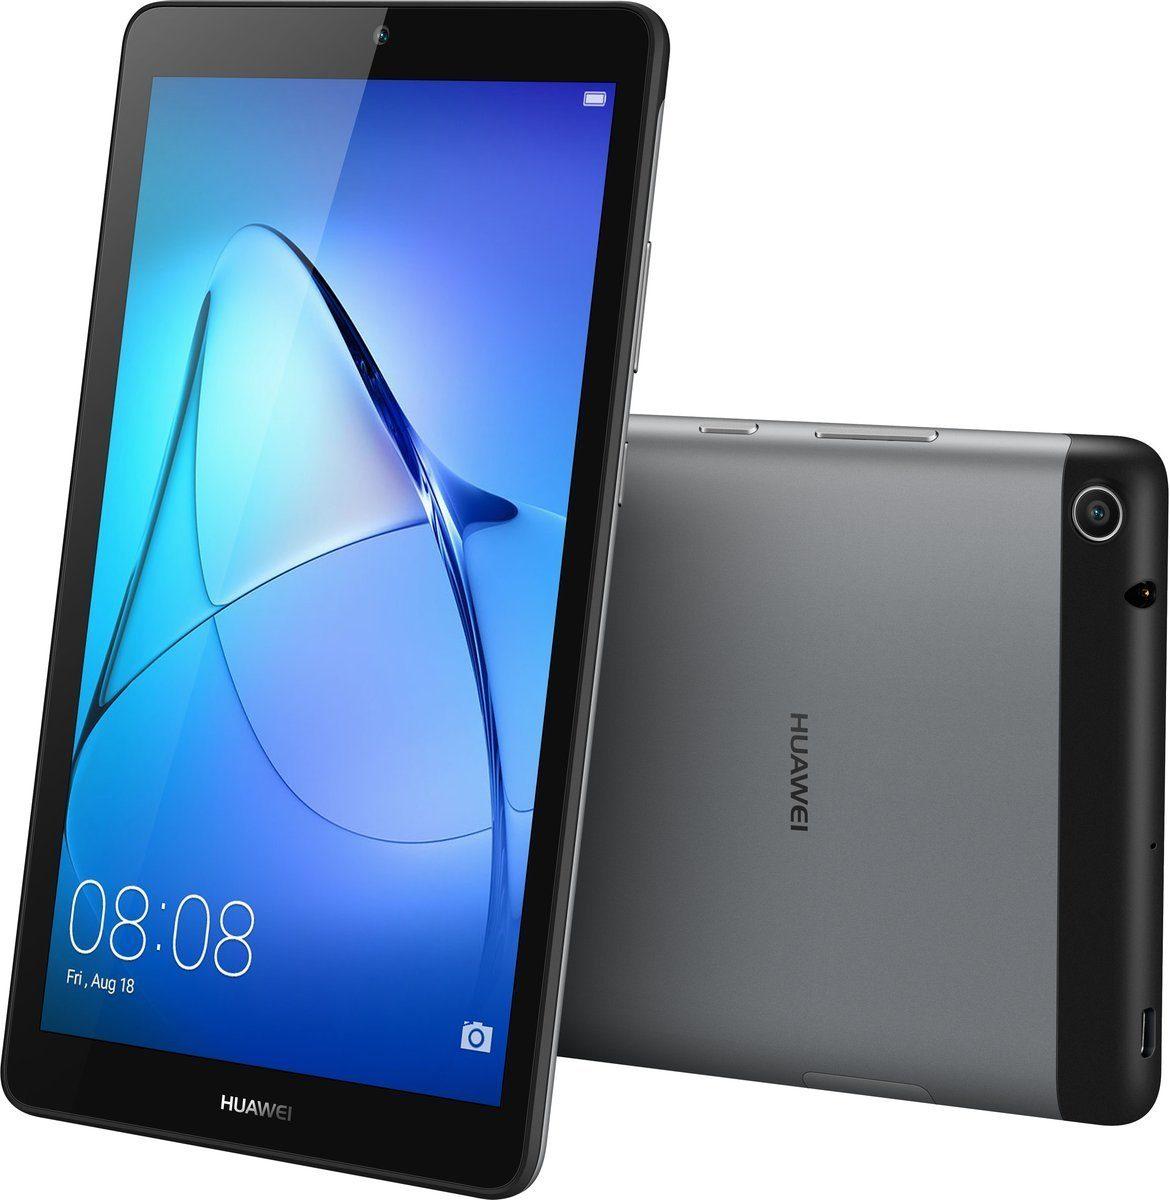 Huawei Tablet »MediaPad T3 7 WiFi 1+8GB«